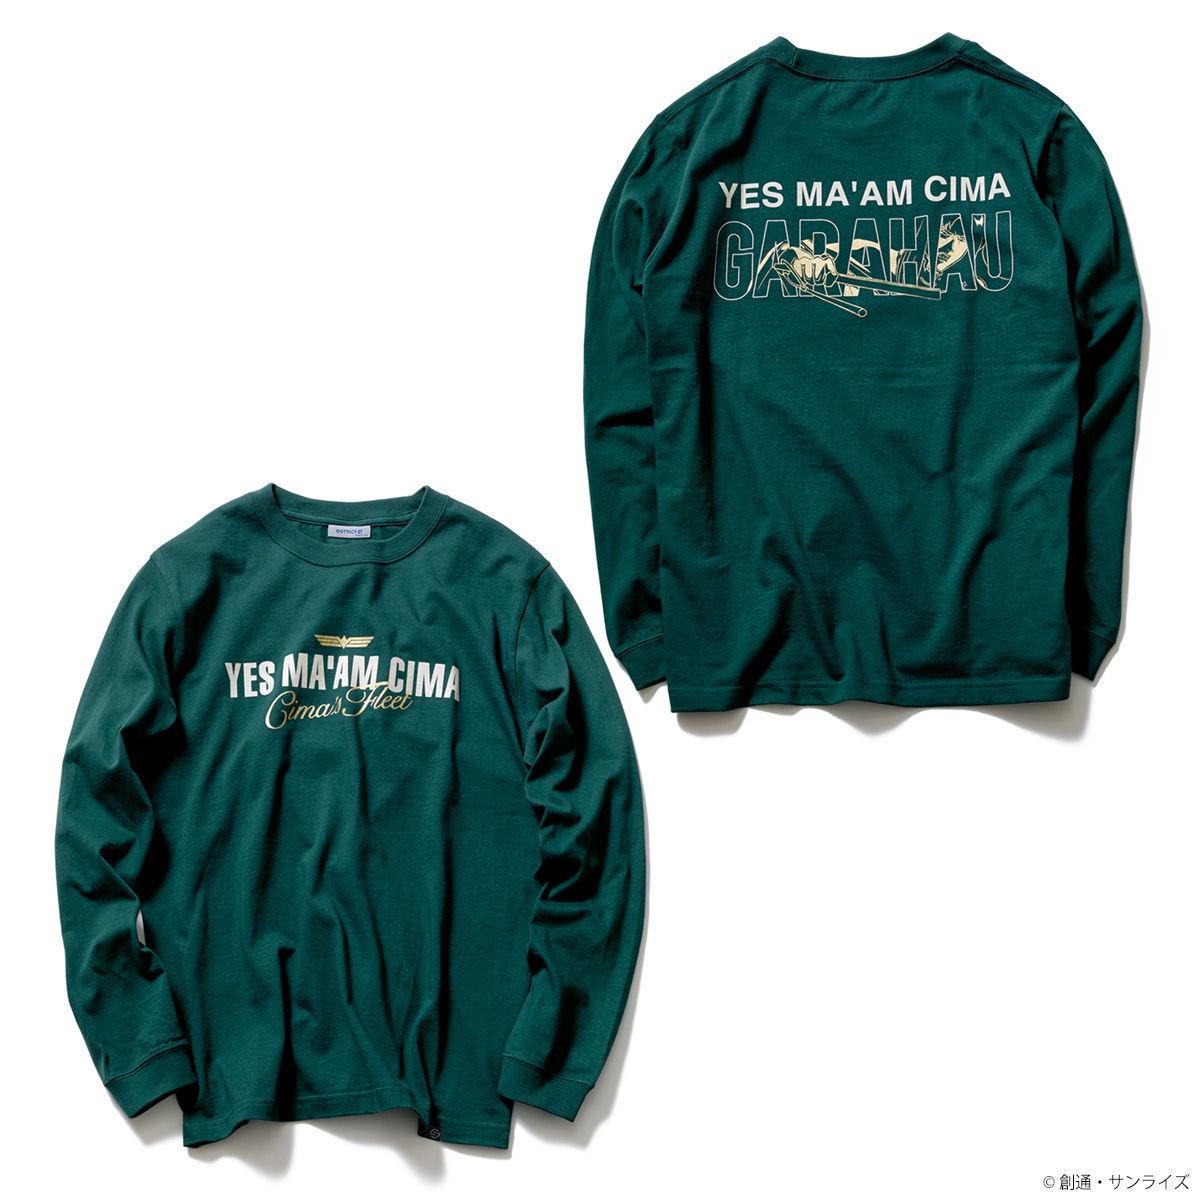 Cima Garahau Long-Sleeve T-shirt—Mobile Suit Gundam 0083: Stardust Memory